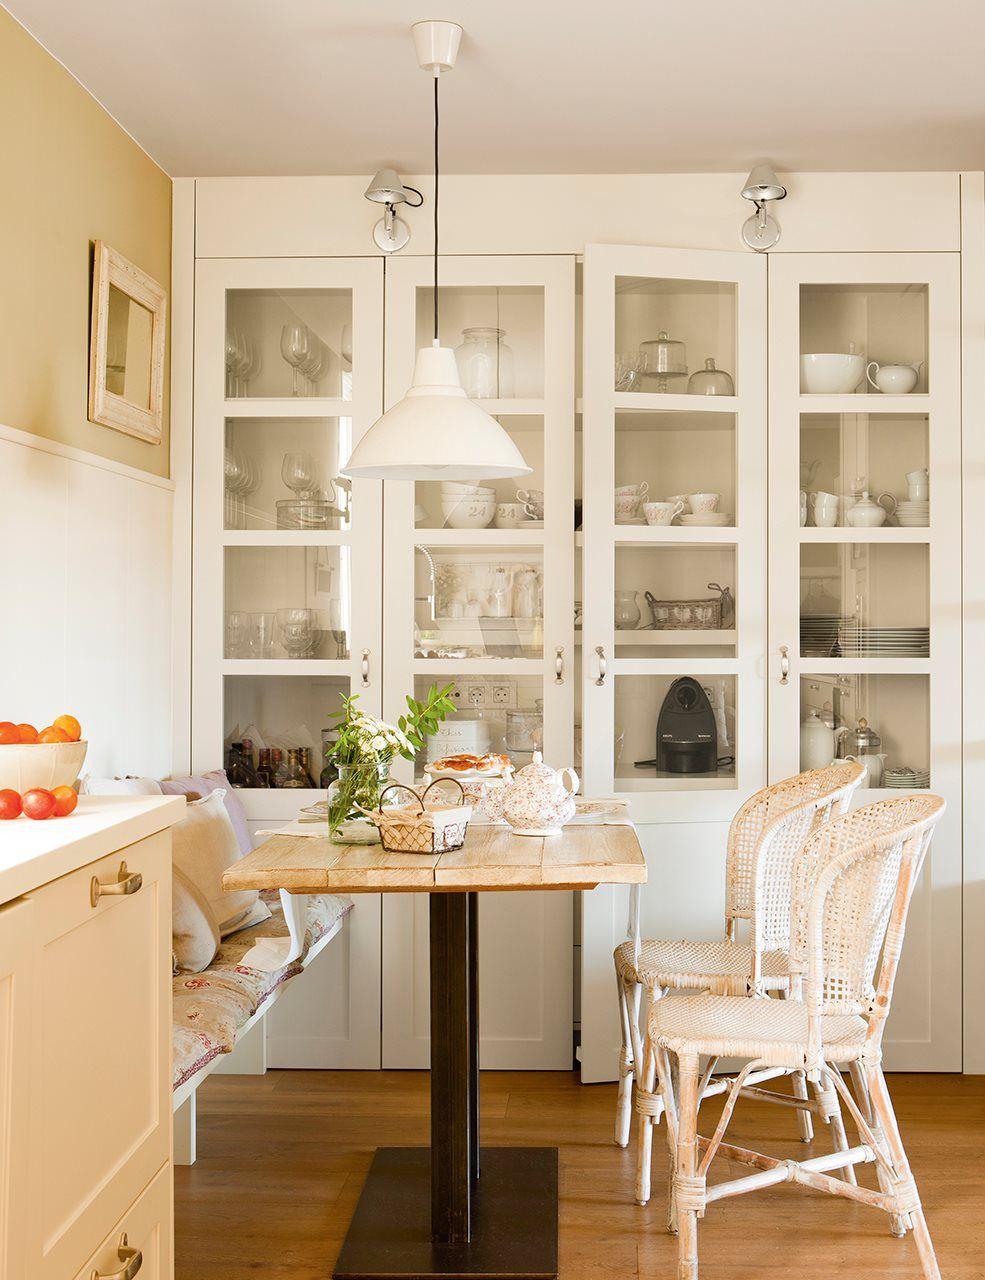 Manual de la iluminación perfecta | Breakfast Nooks | Pinterest | Küche